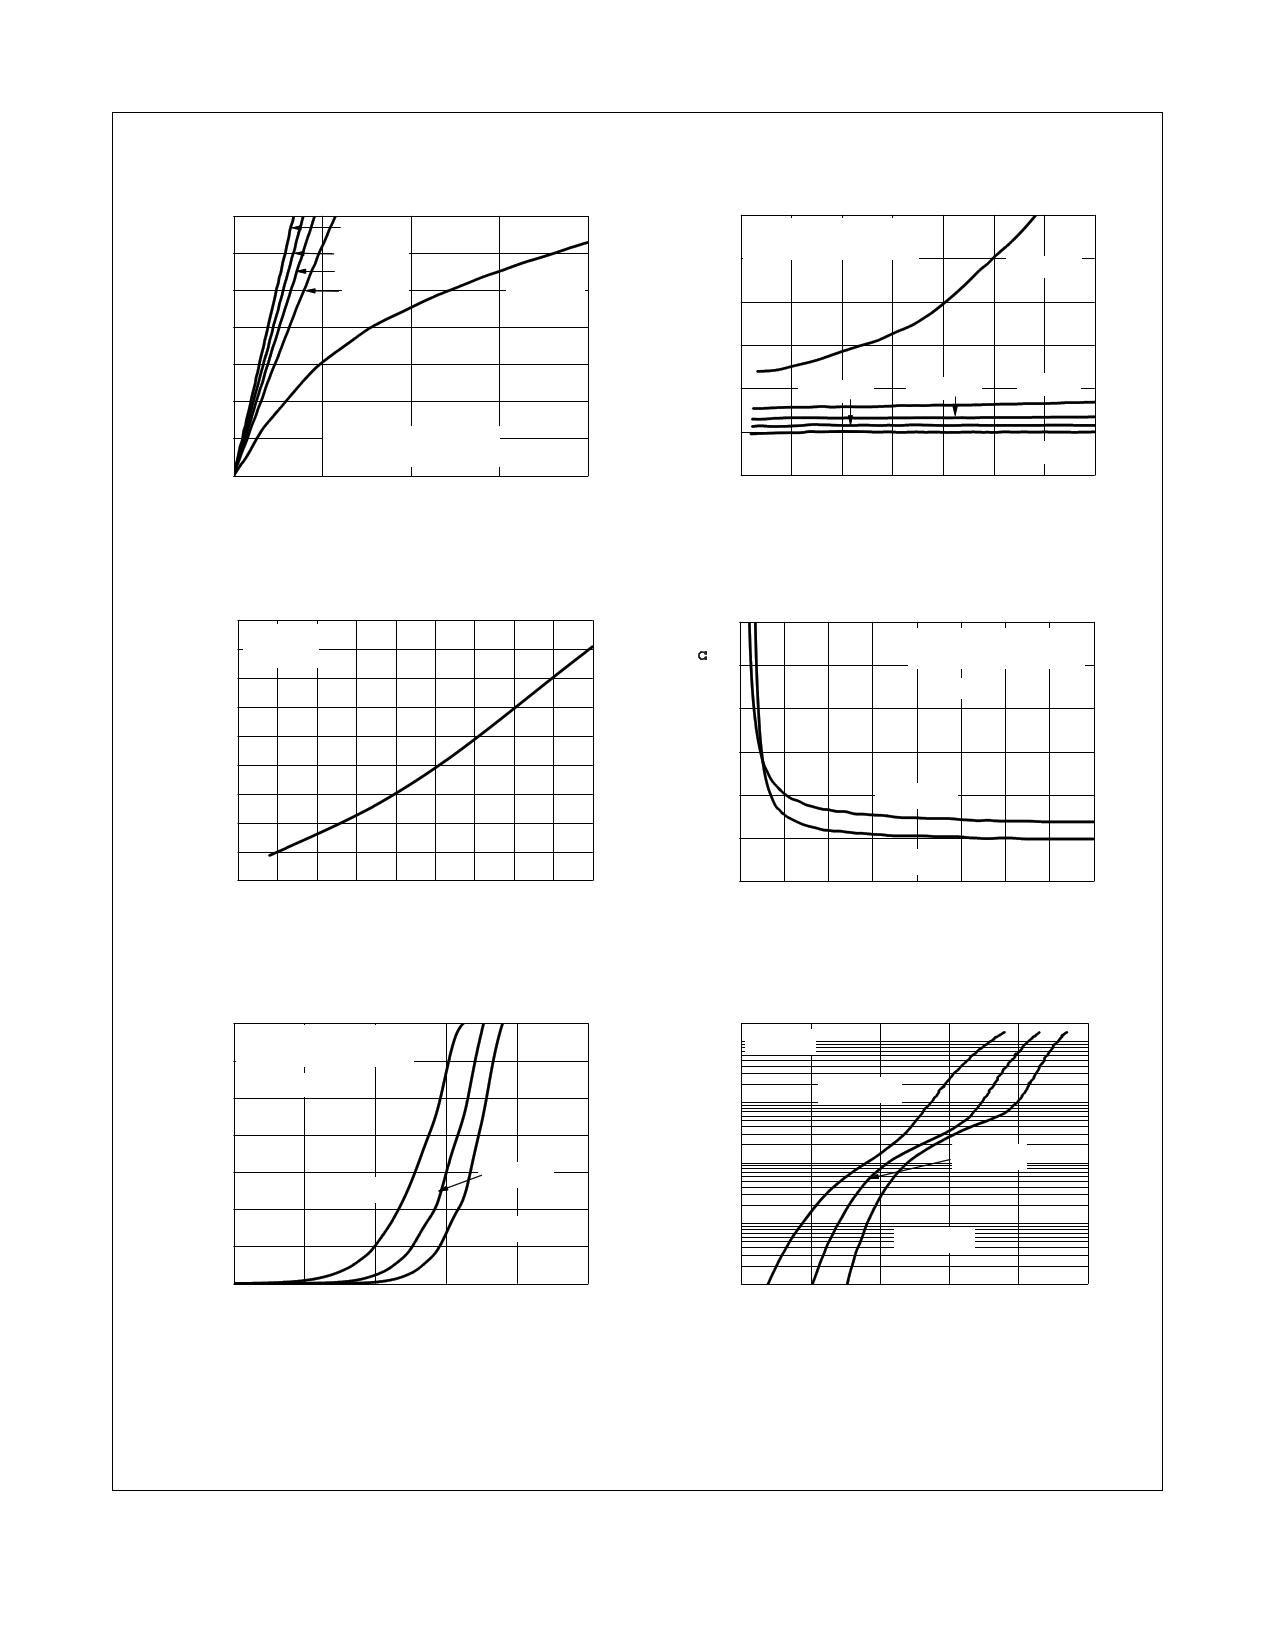 FDMS8558SDC pdf, 반도체, 판매, 대치품